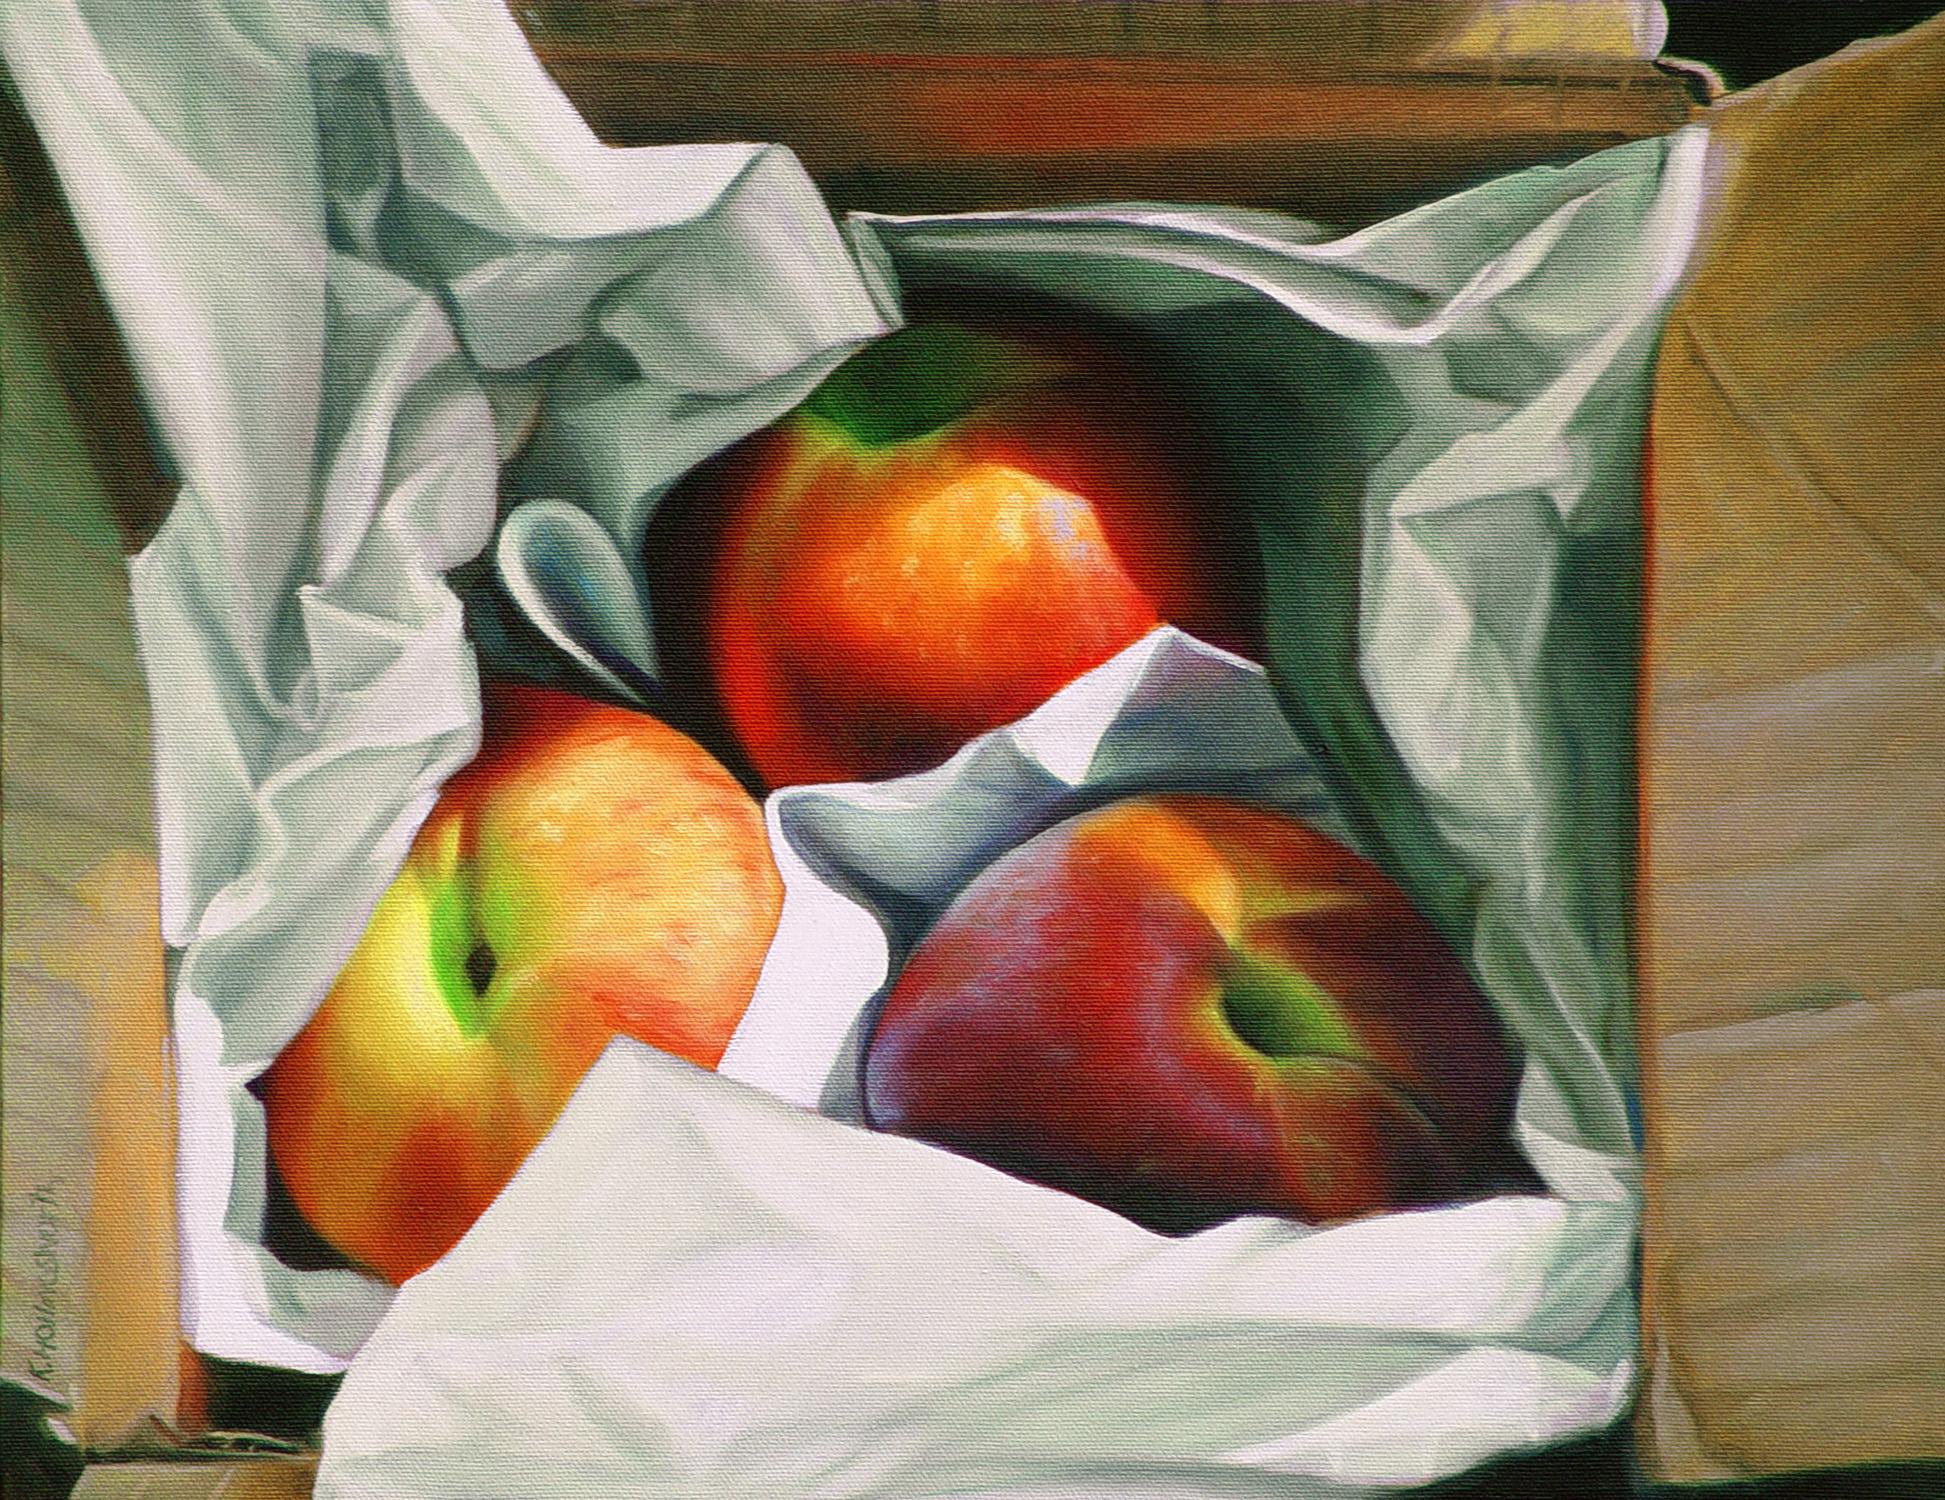 Peaches \ 11 x 14 | Oil on canvas